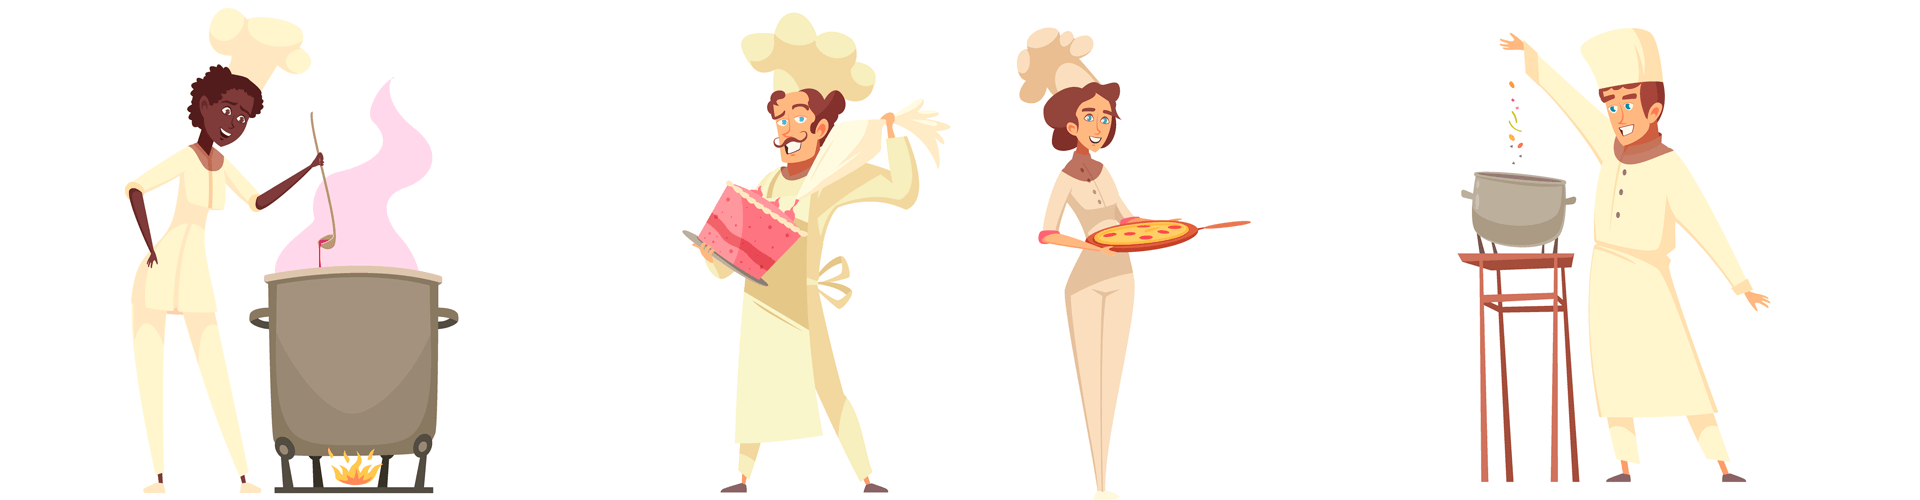 кто такой повар